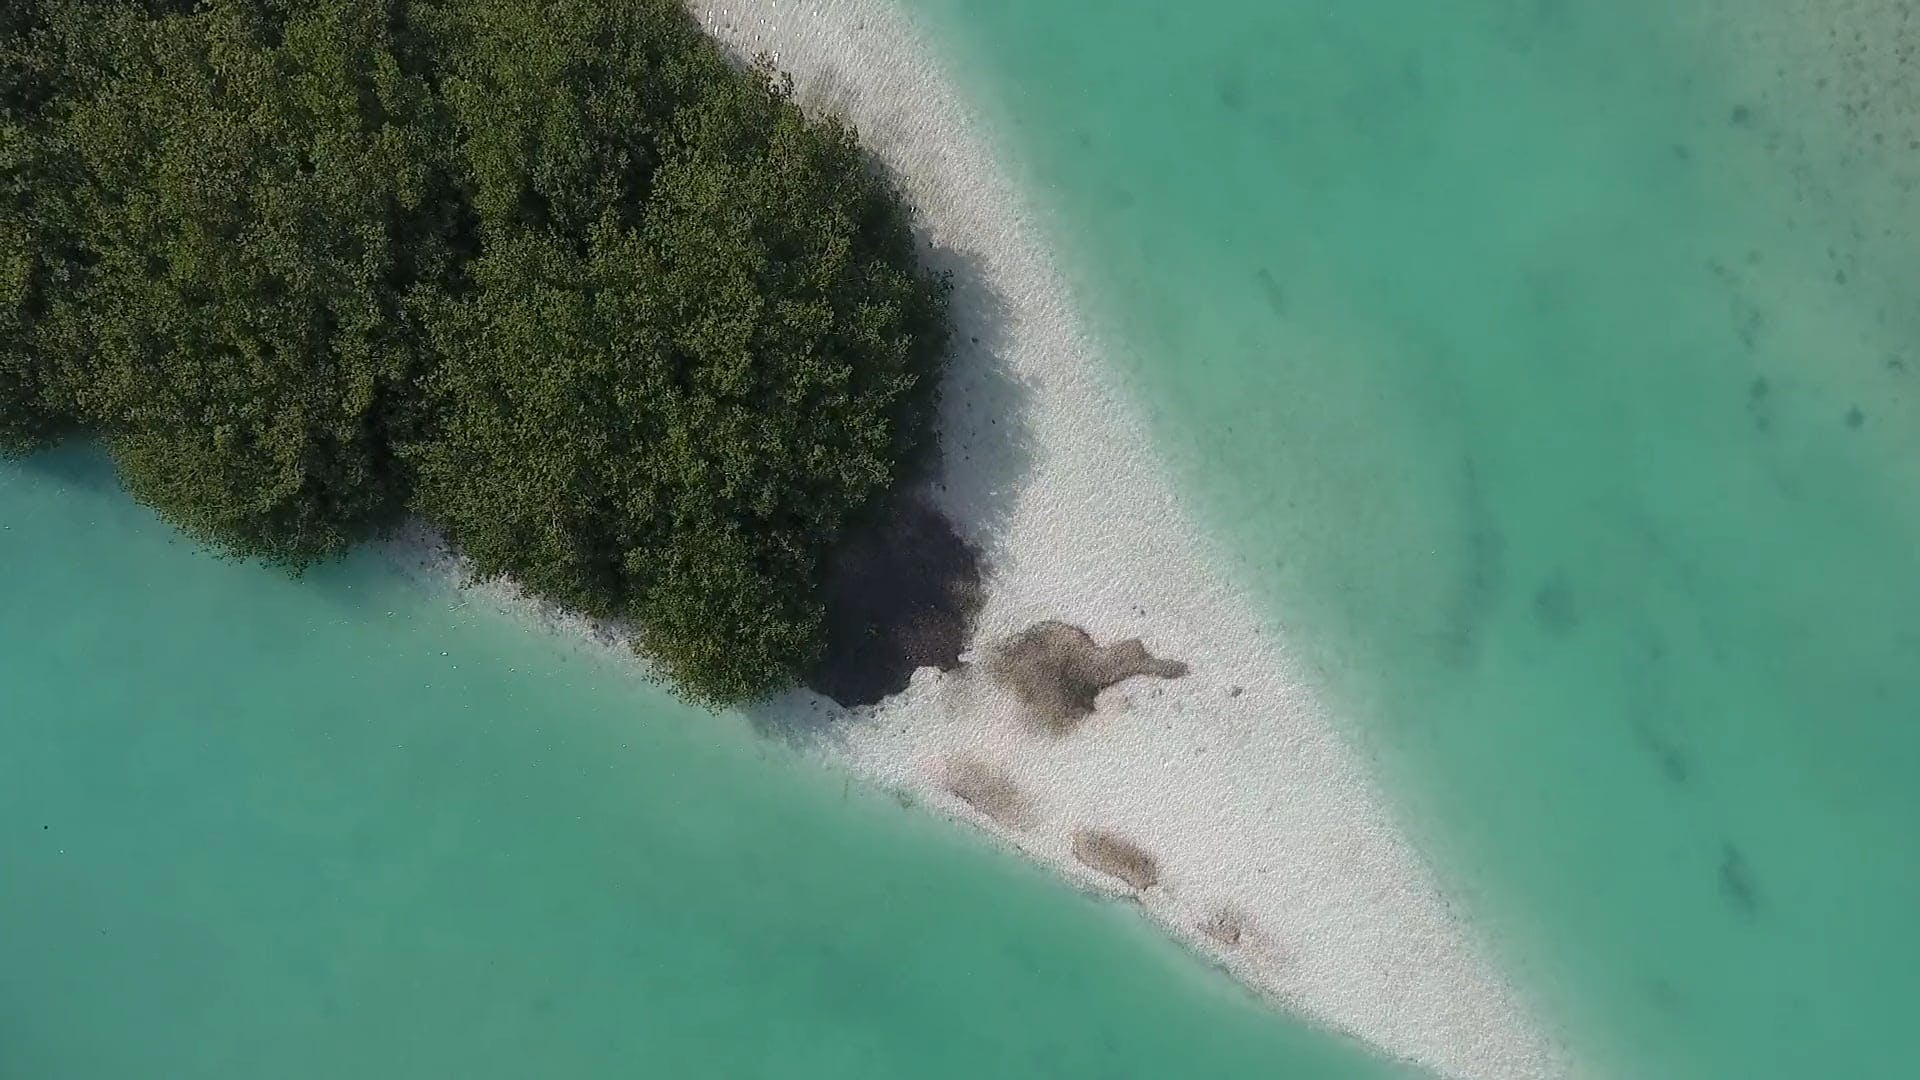 High Angle Shot Of An Island